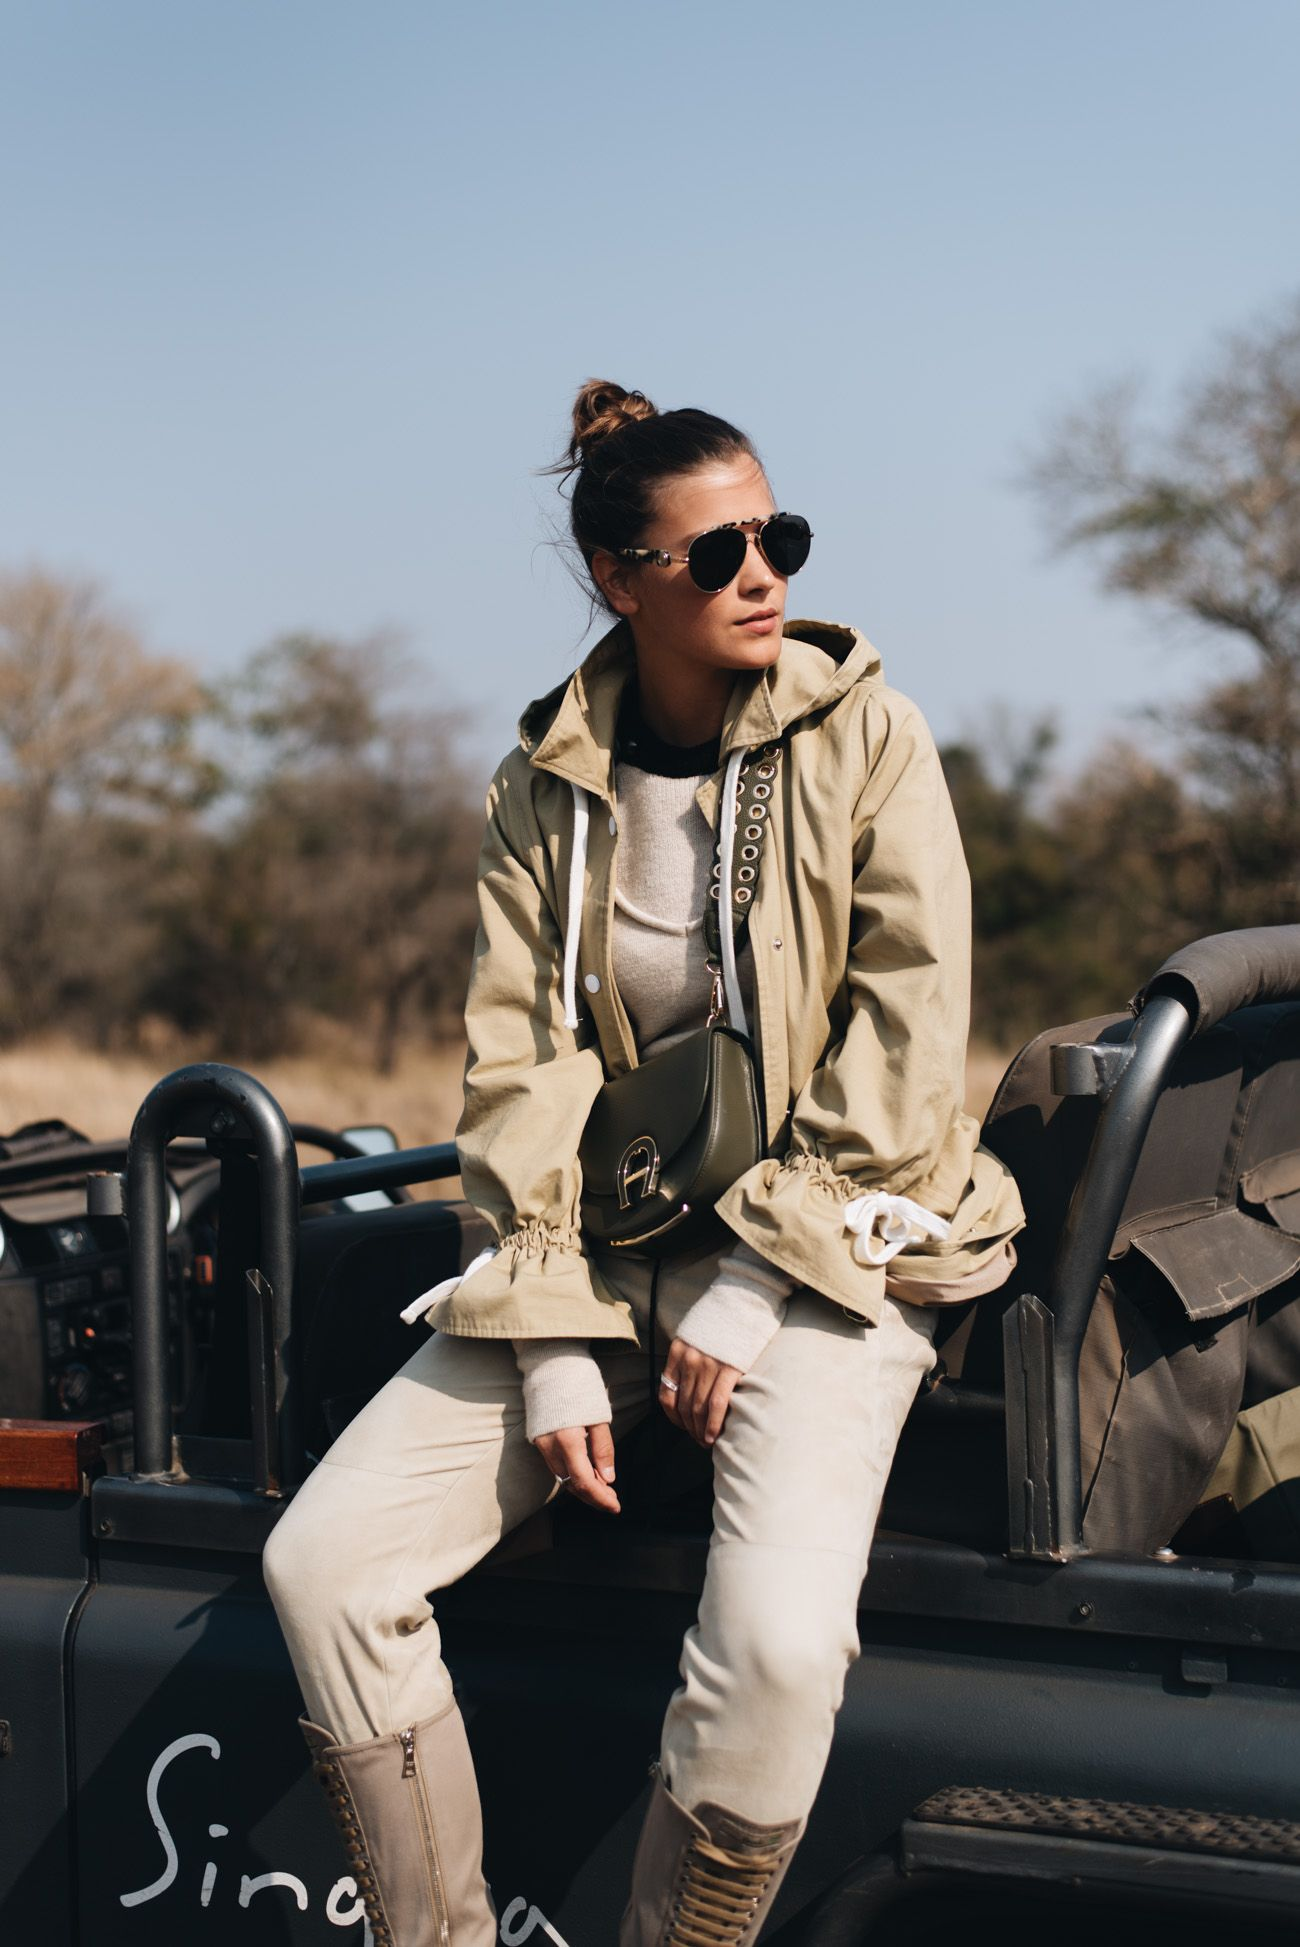 Outfit: Africa Safari Outfit im Krüger Nationalpark mit